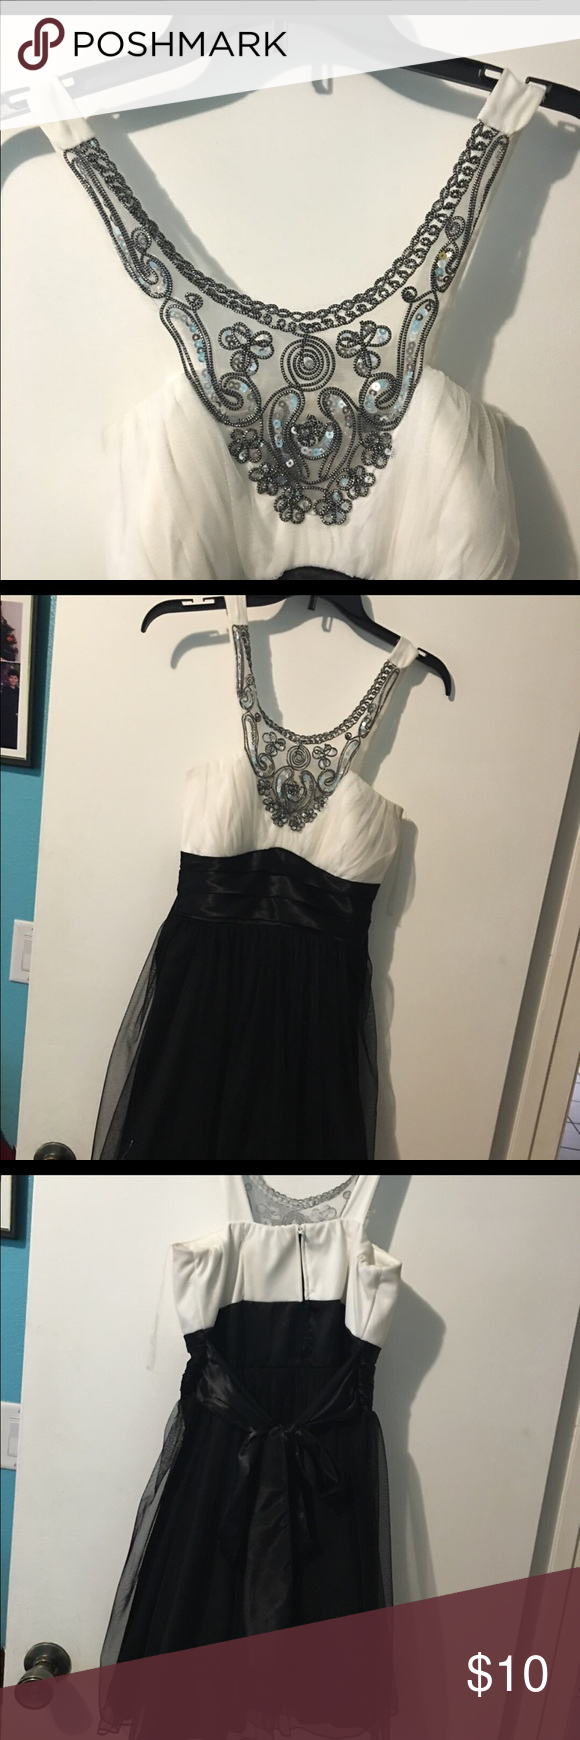 Teens Formal Dress Teen Formal Dresses Semi Formal Dresses And